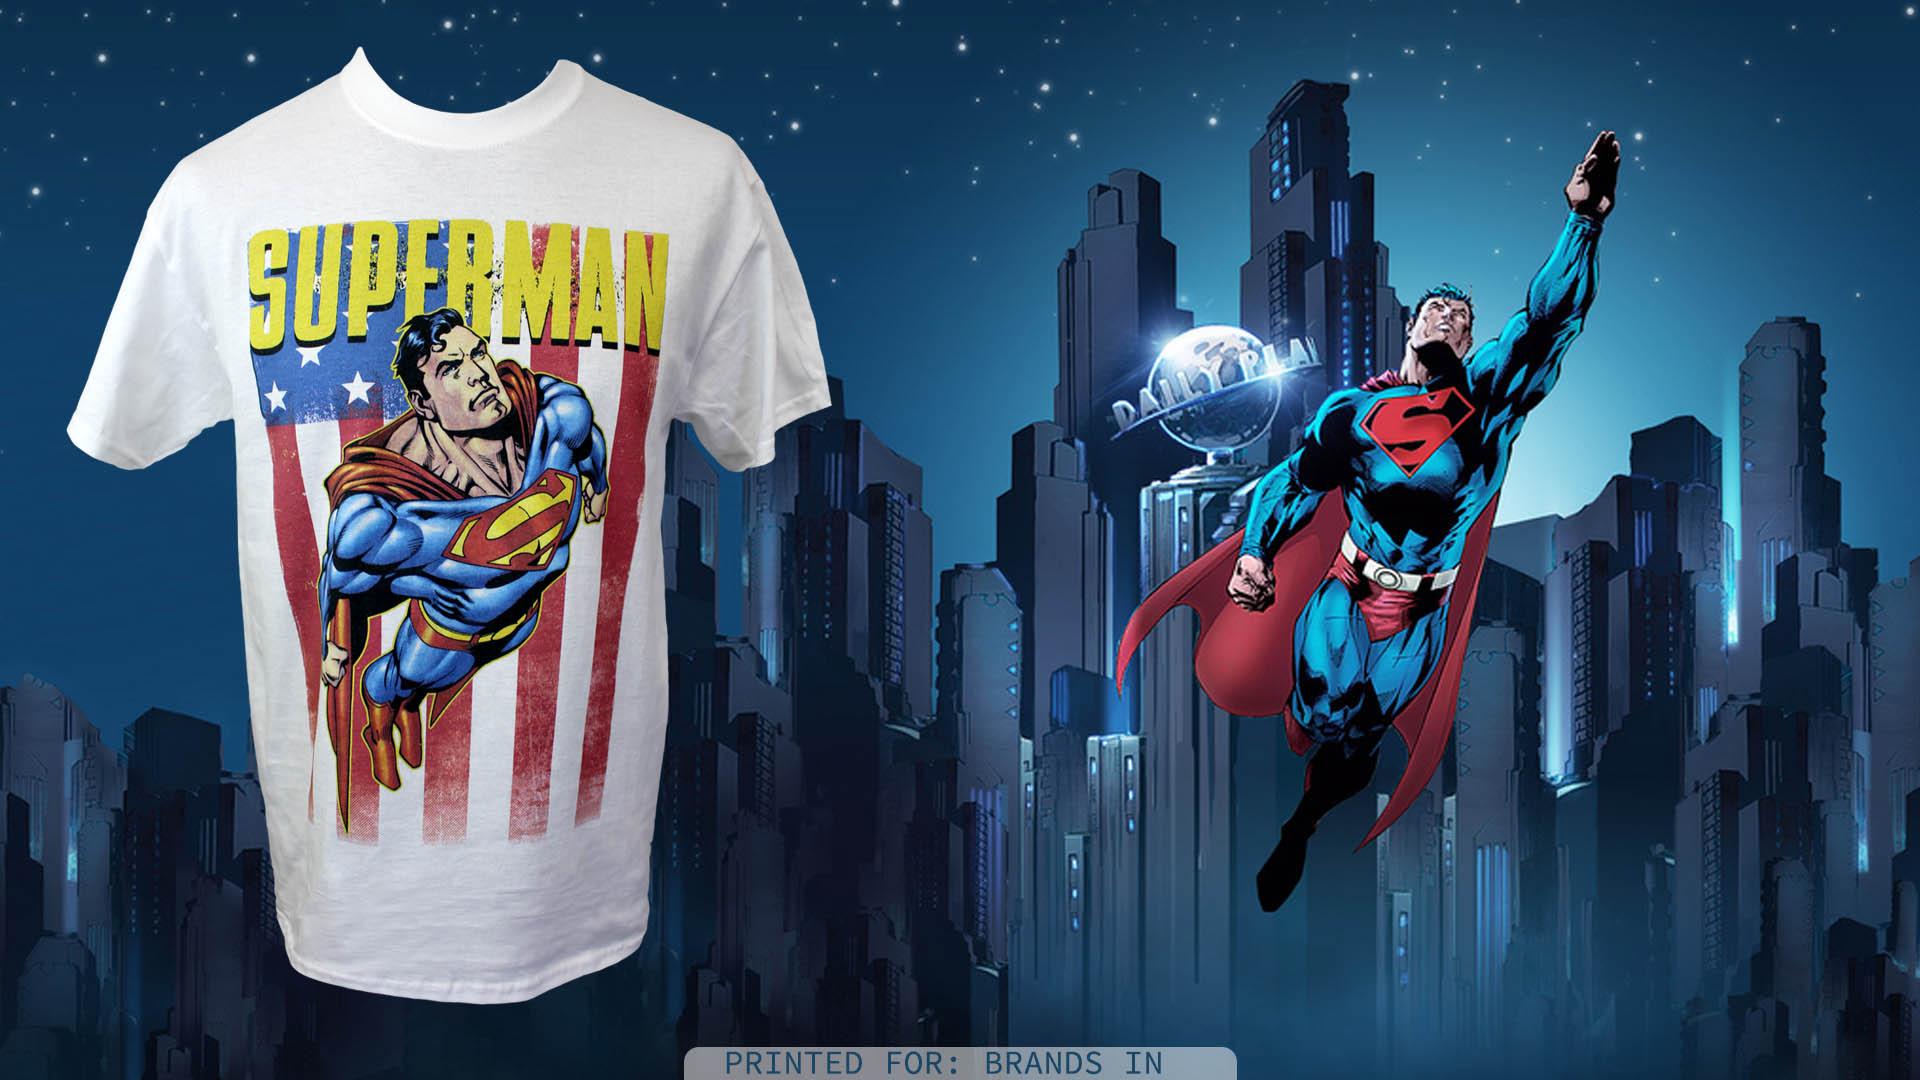 Shirt design printer - Dtg Printing Superman T Shirt Printing